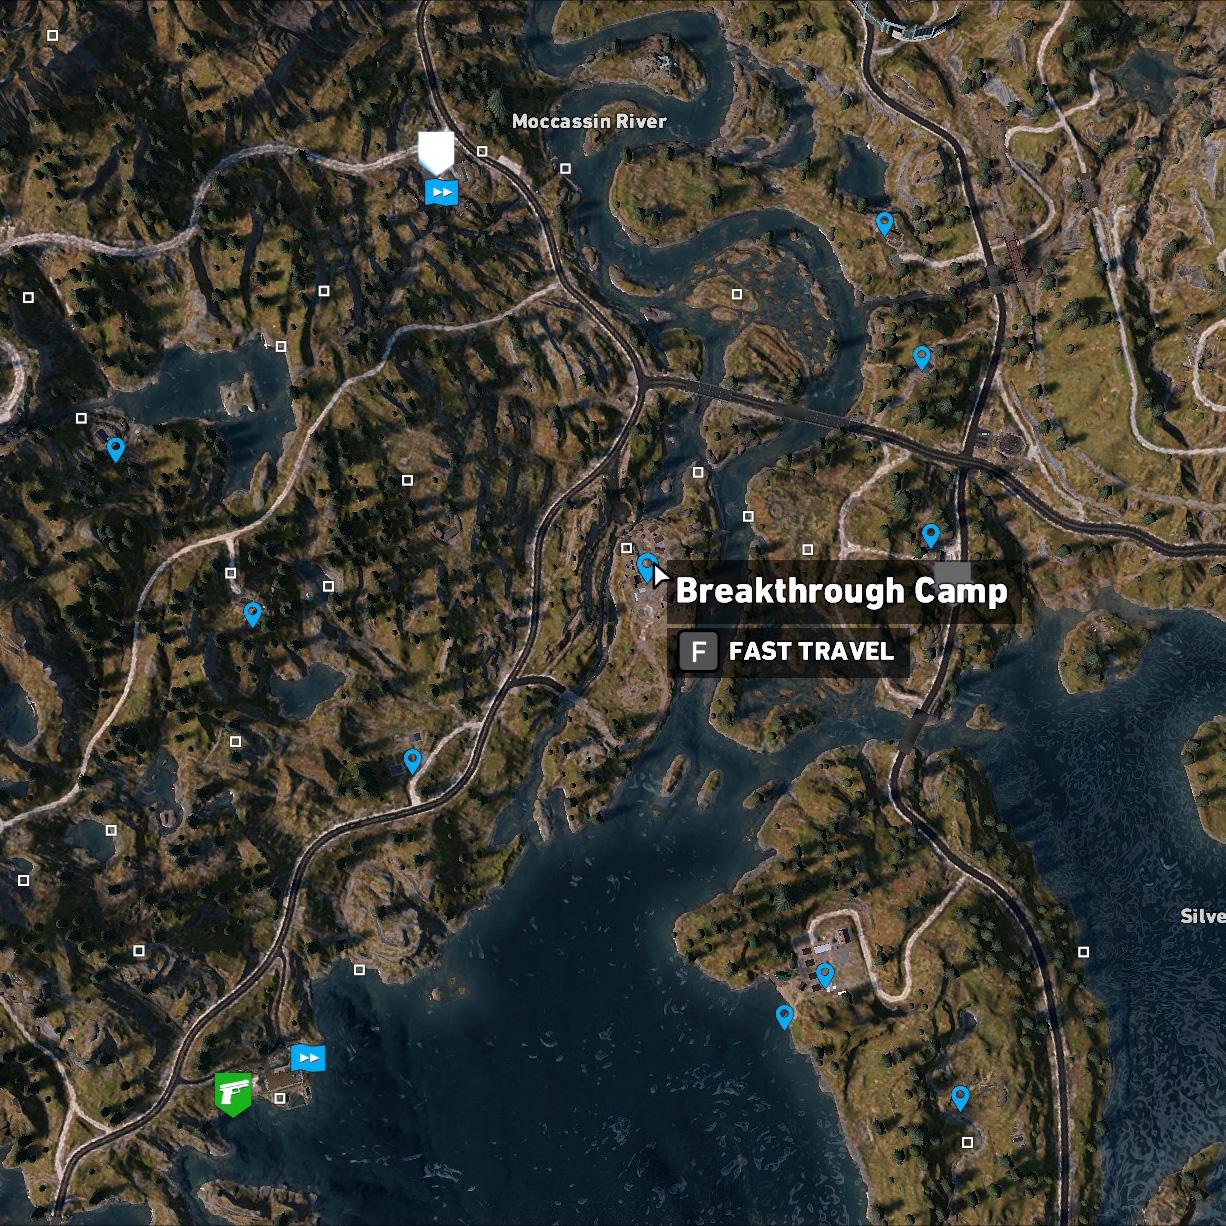 Breakthrough Camp